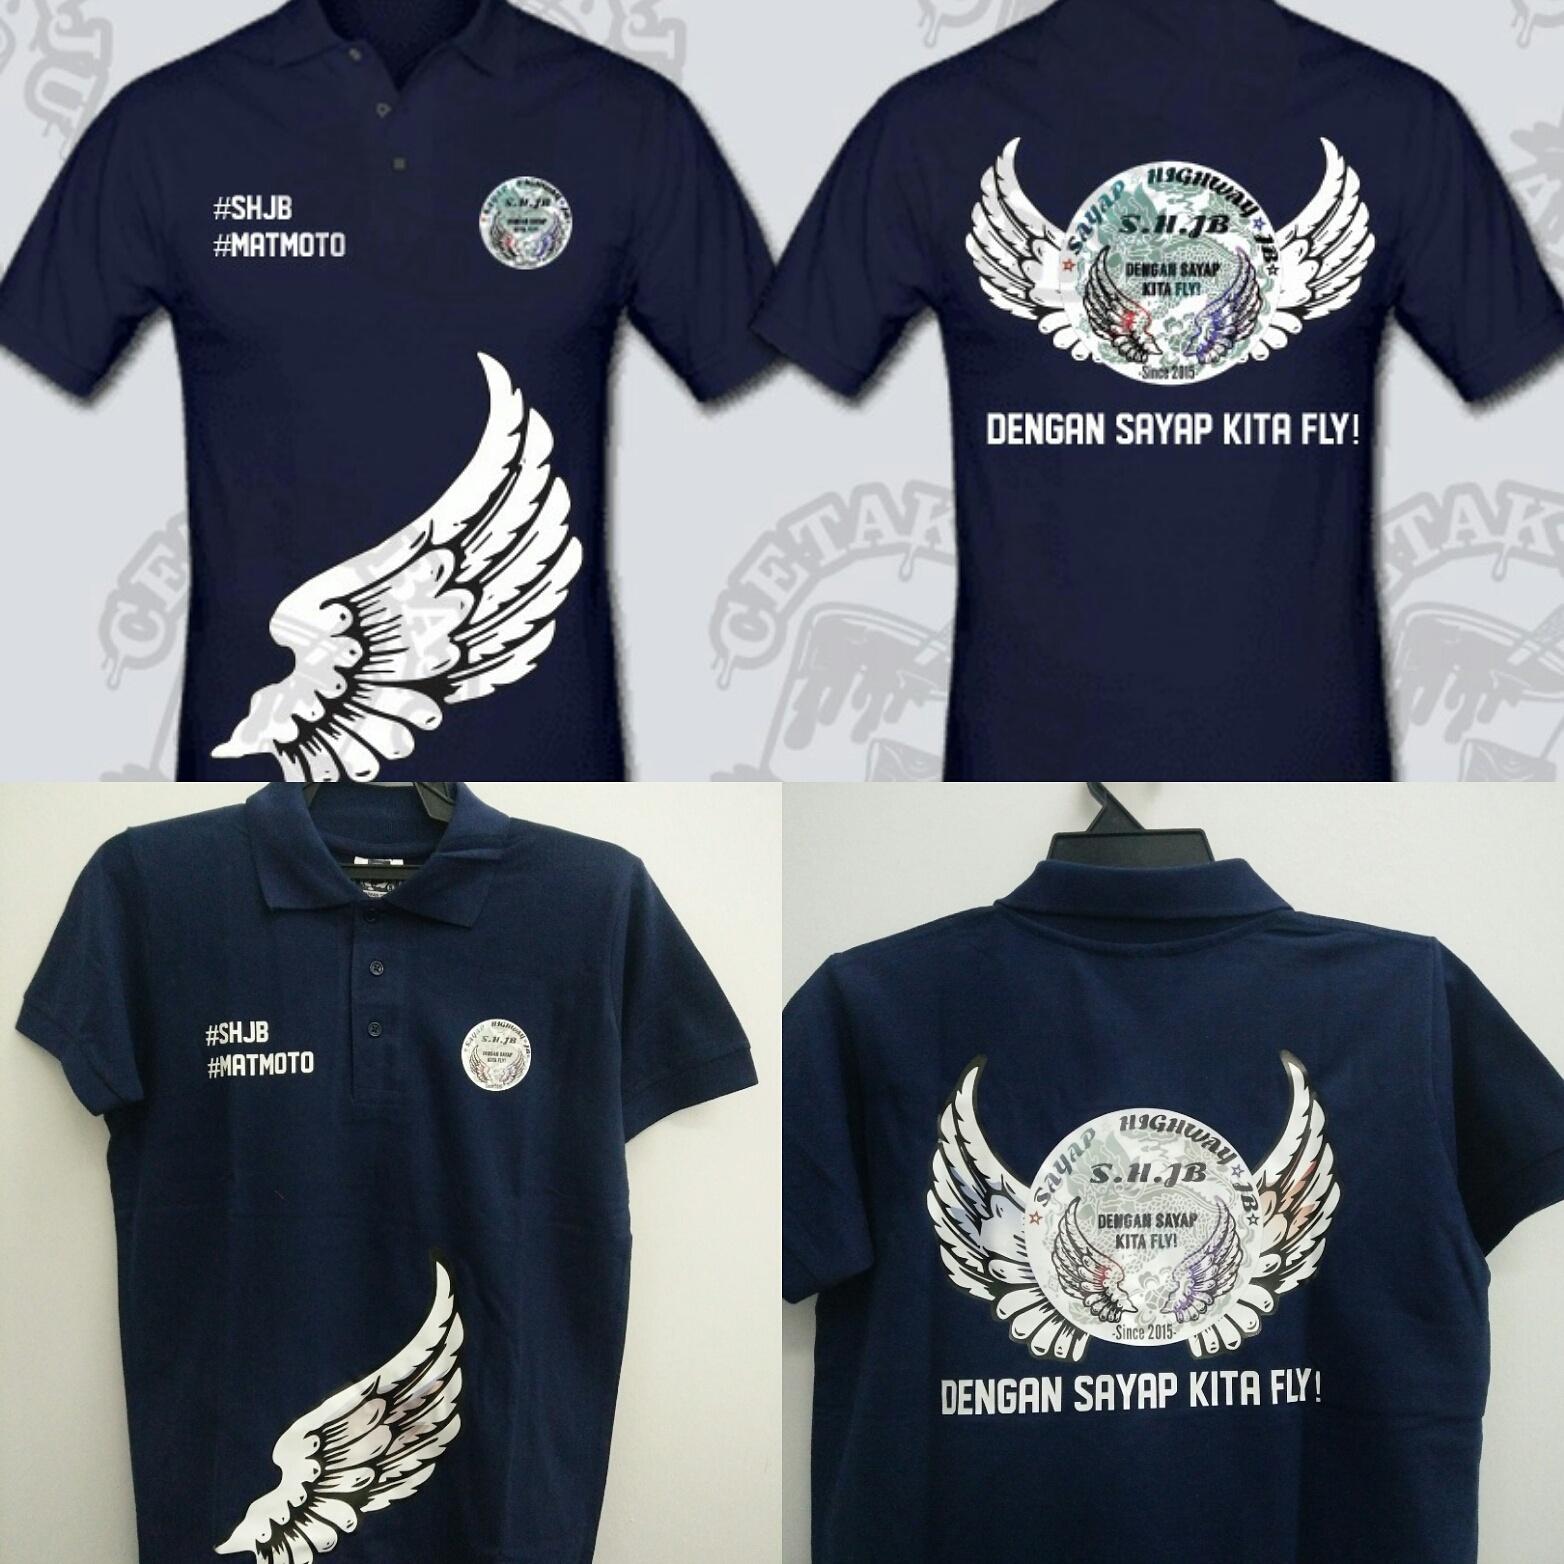 Contoh design tshirt kelas - Tshirt Mat Motor